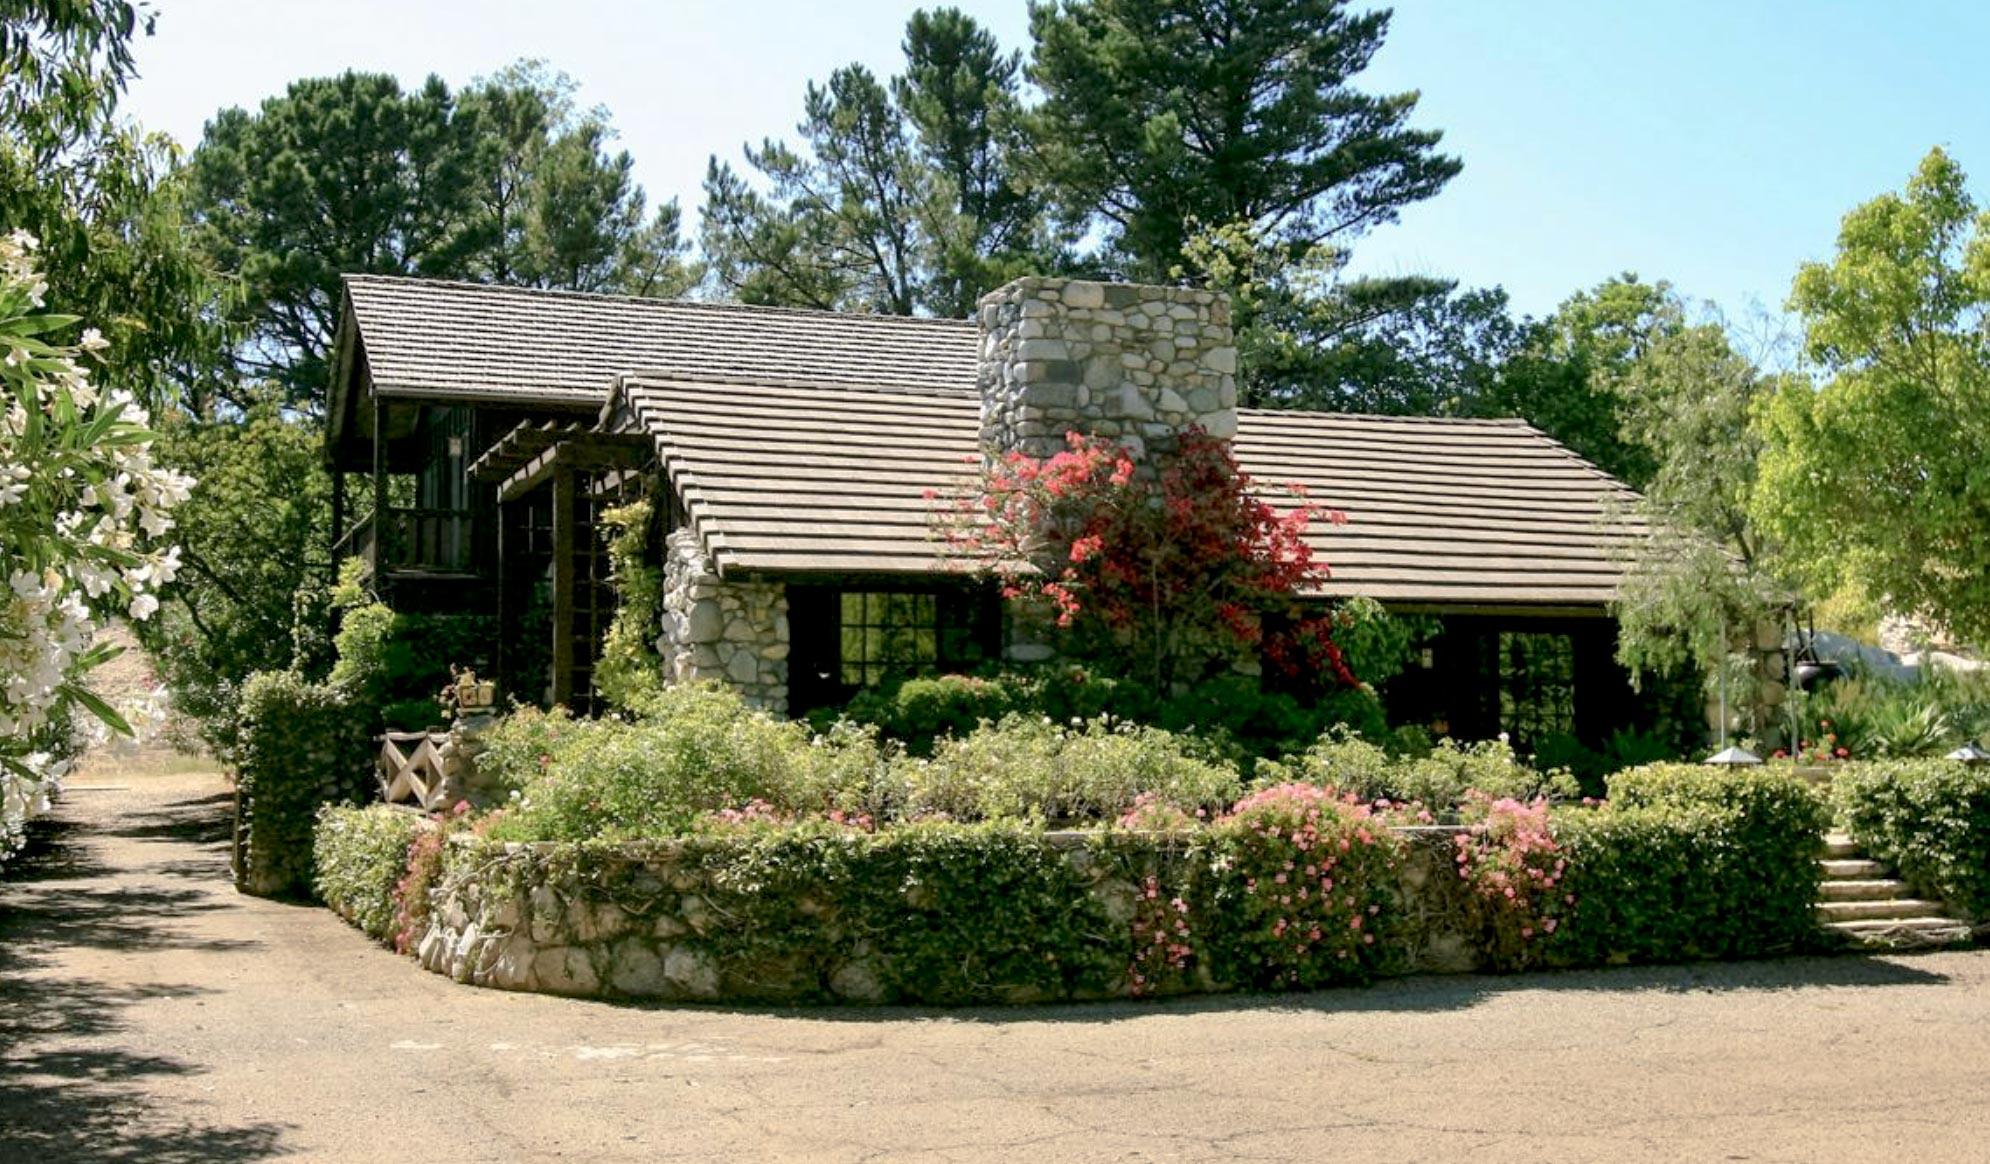 S.E.A.-Studio-Environmental-Architecture-David-Hertz-FAIA-Tony-Duquette-Xanabu-Malibu-California-adaptive-reuse-sustainable-regenerative-restorative-green-design-airplane-upcycle-recycle-found-object-historic-preservation-Hollywood-set-bony-ridge-32.jpg